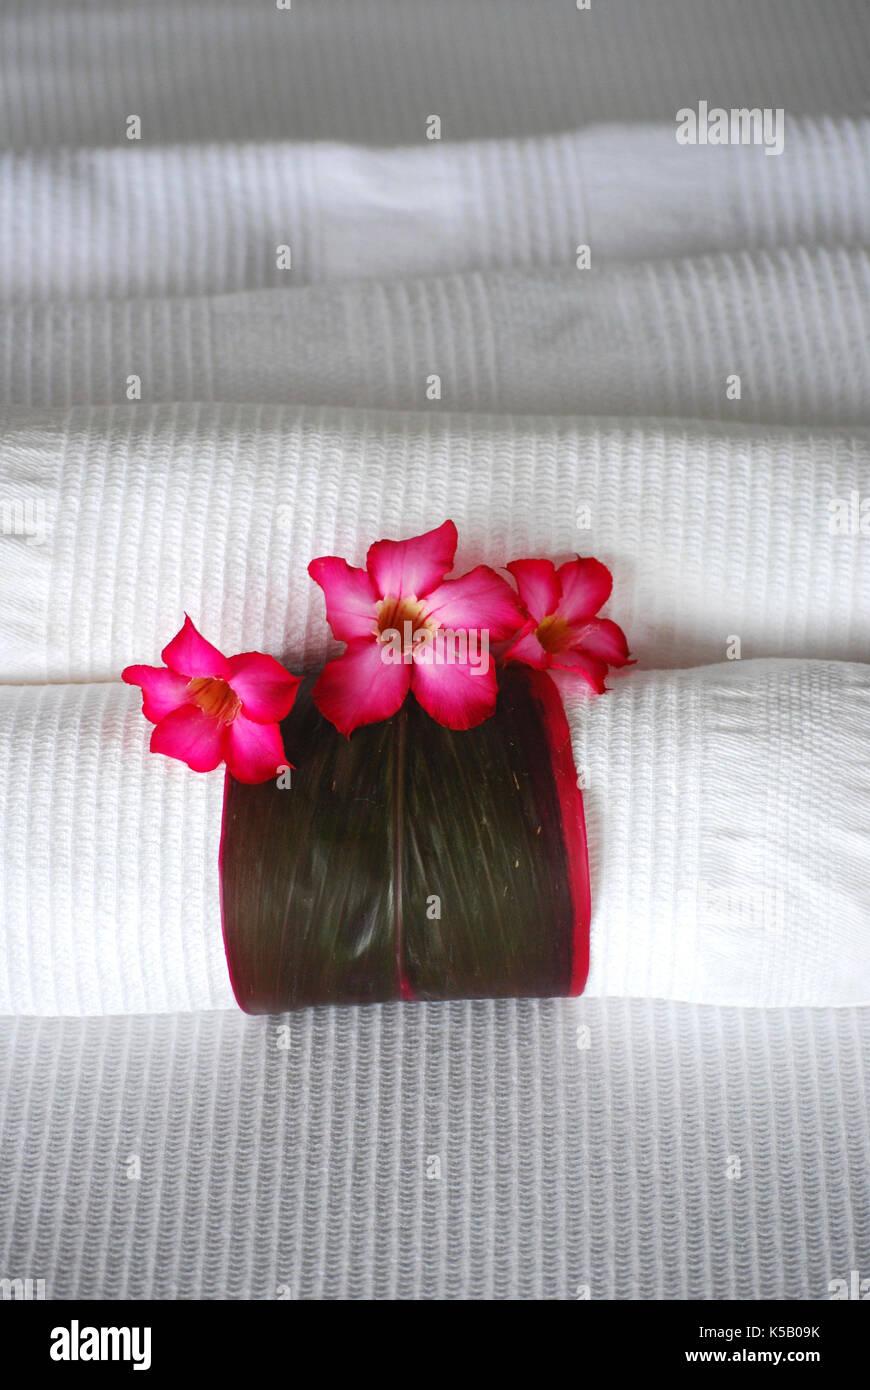 Spa towels - Yelapa, Mexico - Stock Image